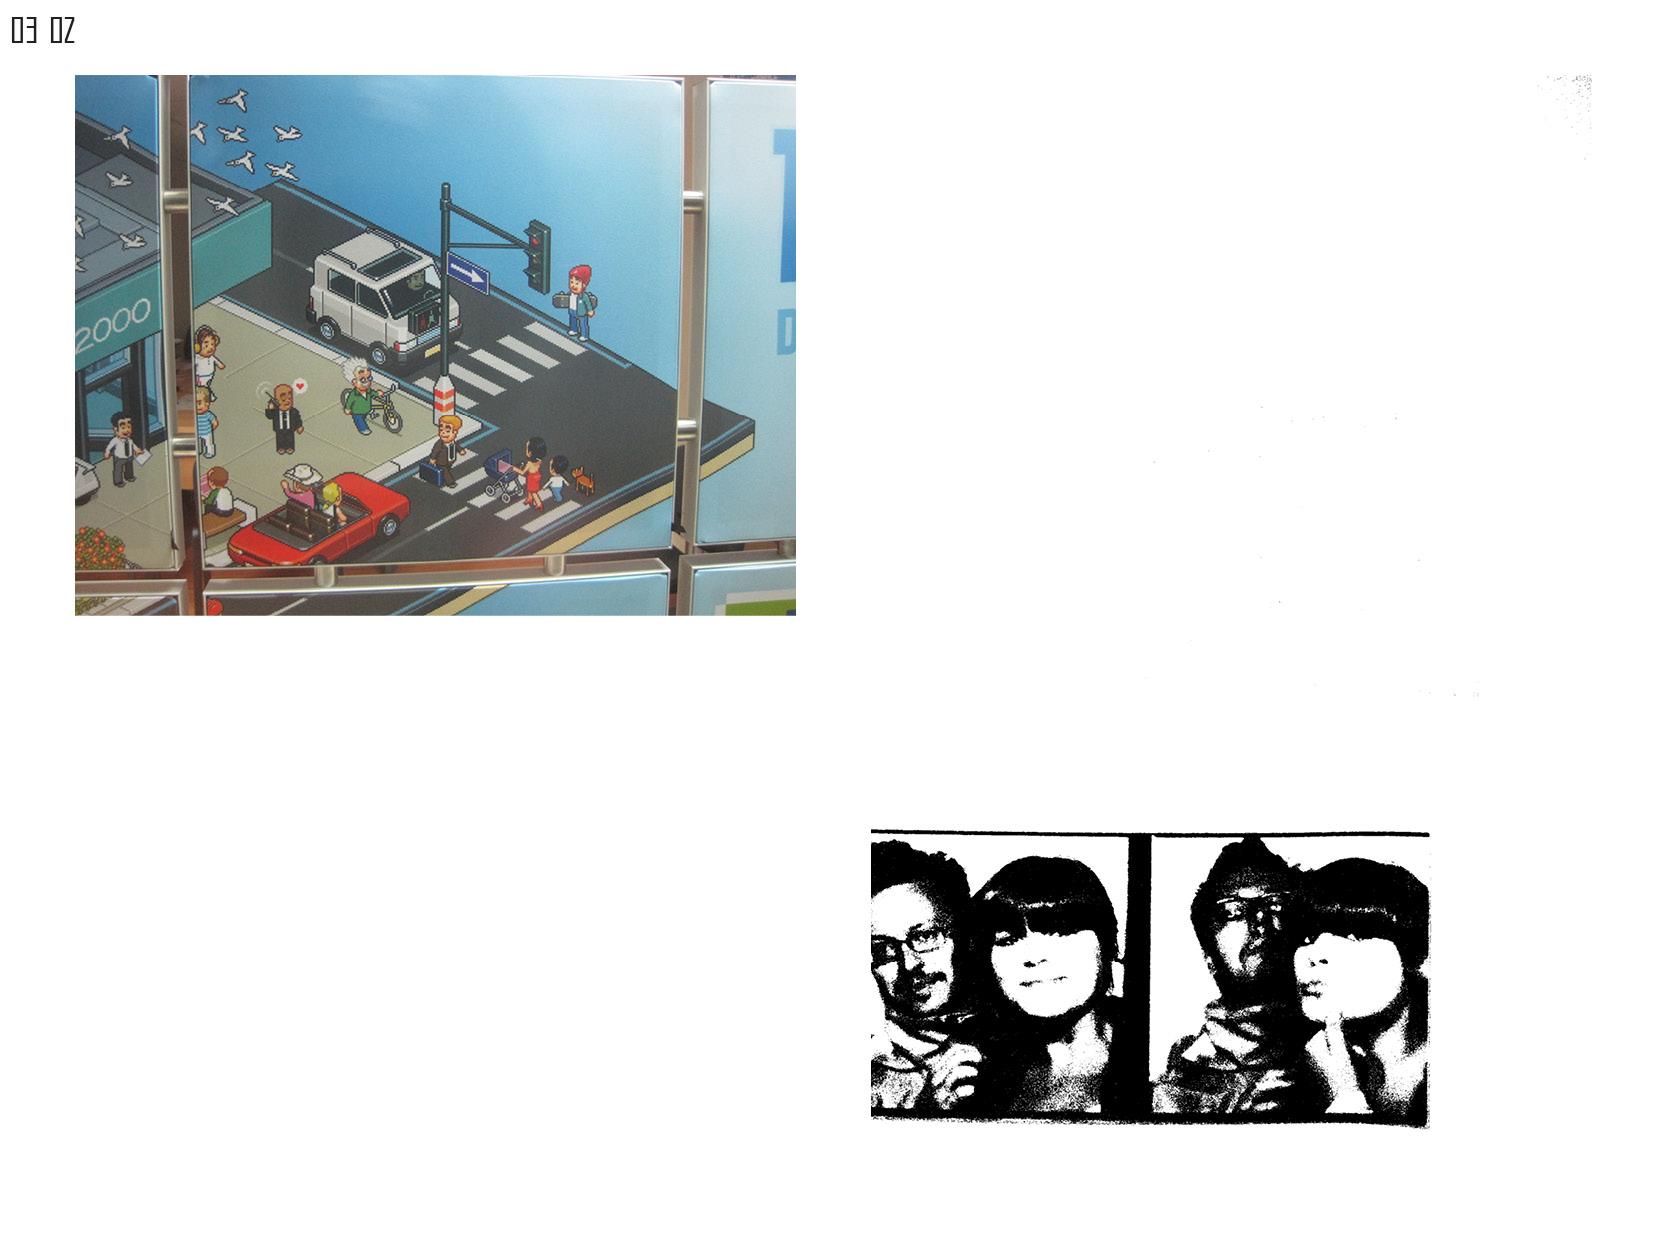 Gerrit-Schweiger-Dialog-Städte-Paris-Berlin-Jessica-Blank-Experiment-Fotoserie-Tagebuch-visuelle-Kommunikation-94